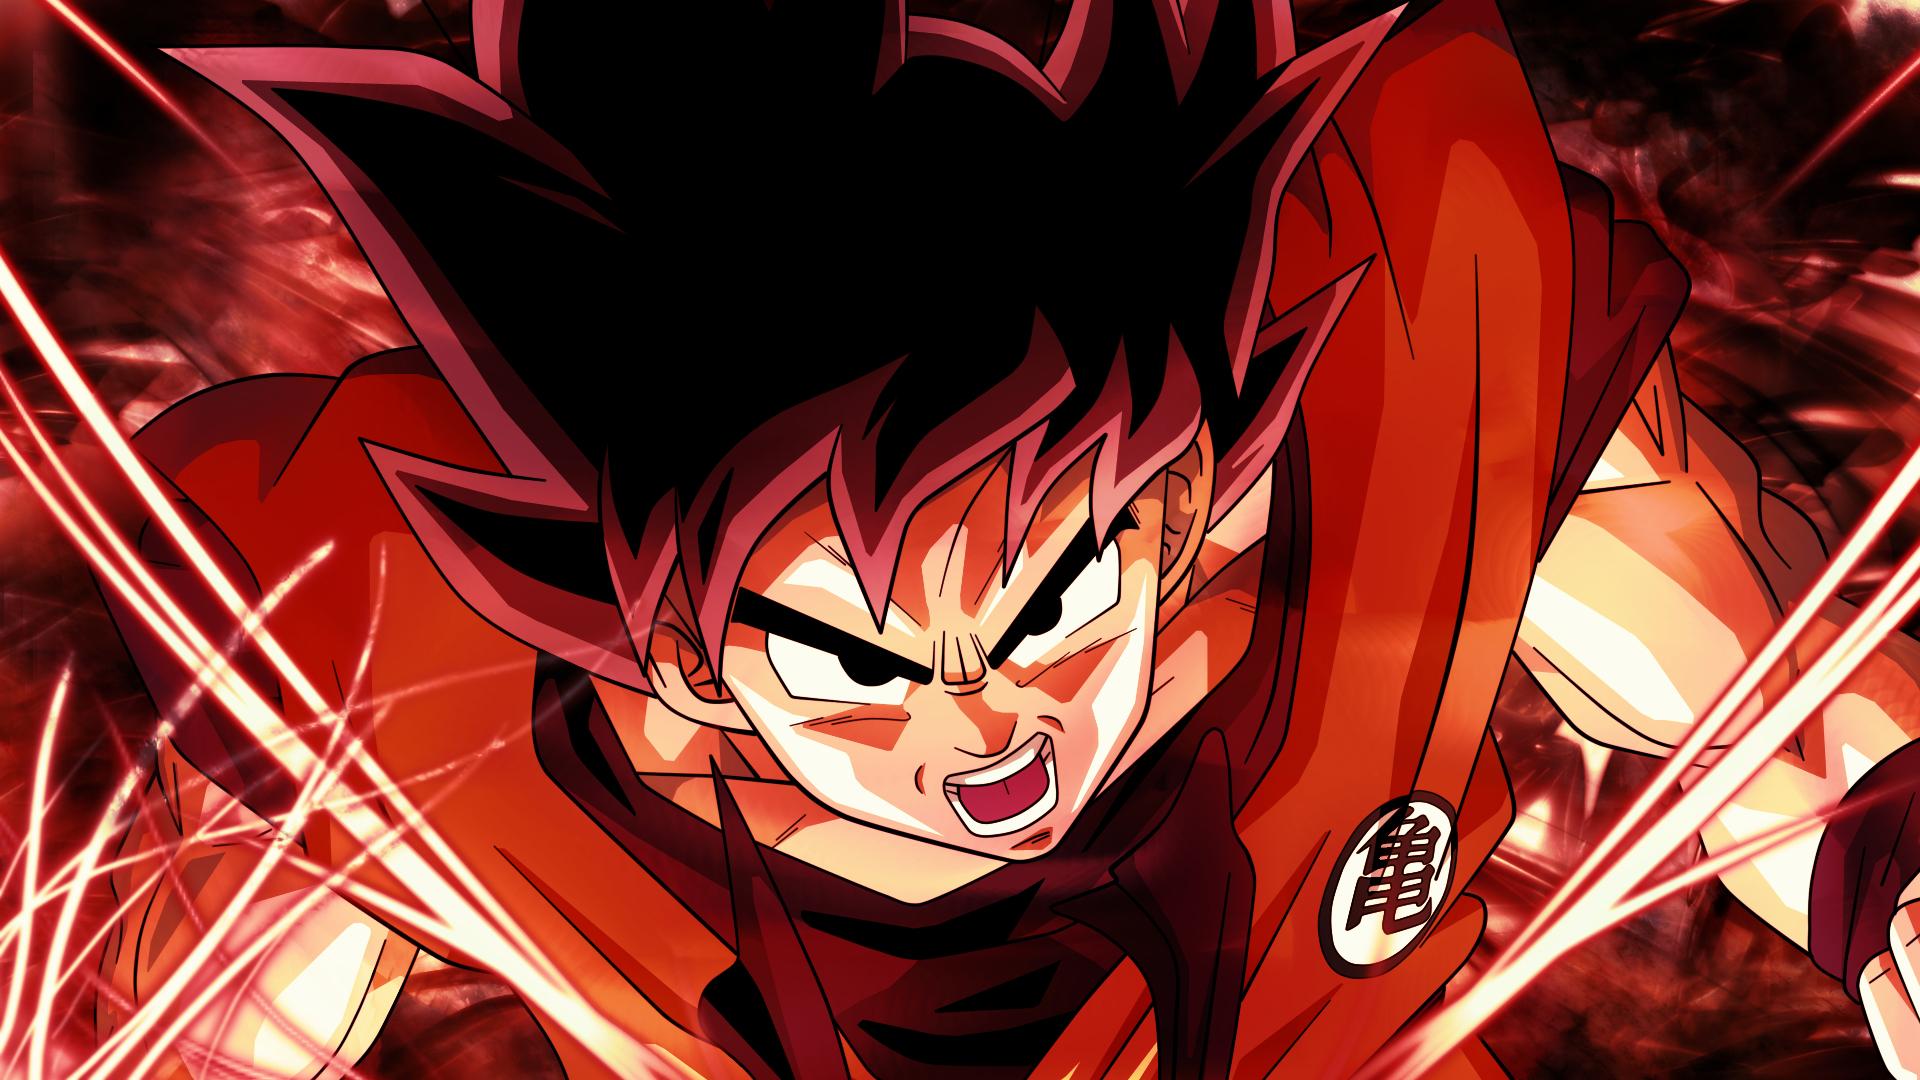 El merecido post a Goku   Taringa 1920x1080